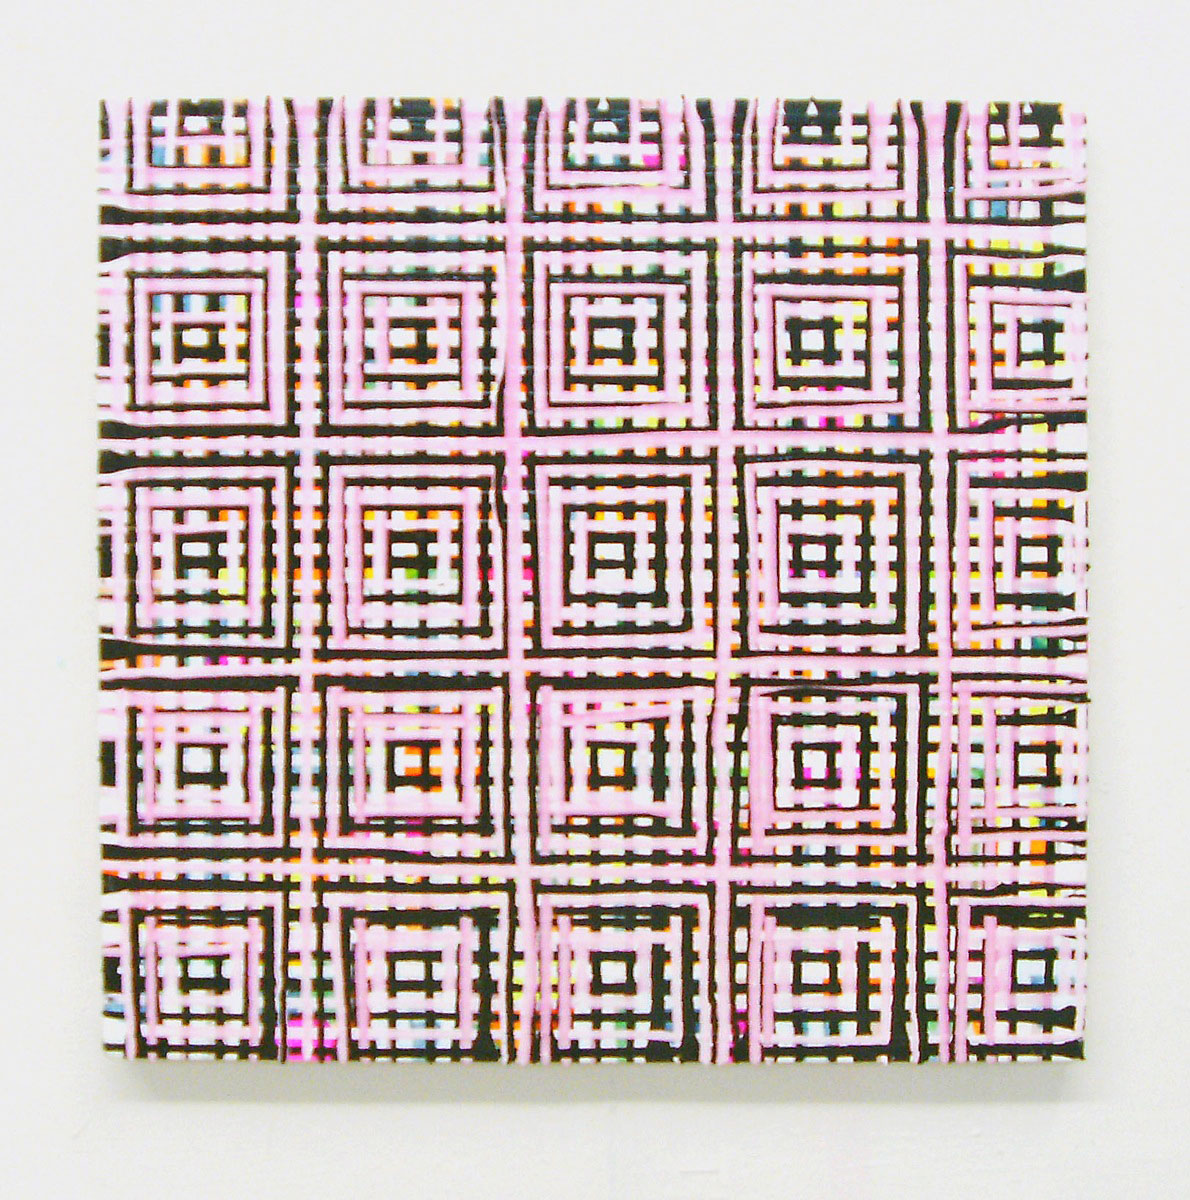 """Gridgrid"", 50x50 cm, Acrylfarbe, Leinwand, 2008"